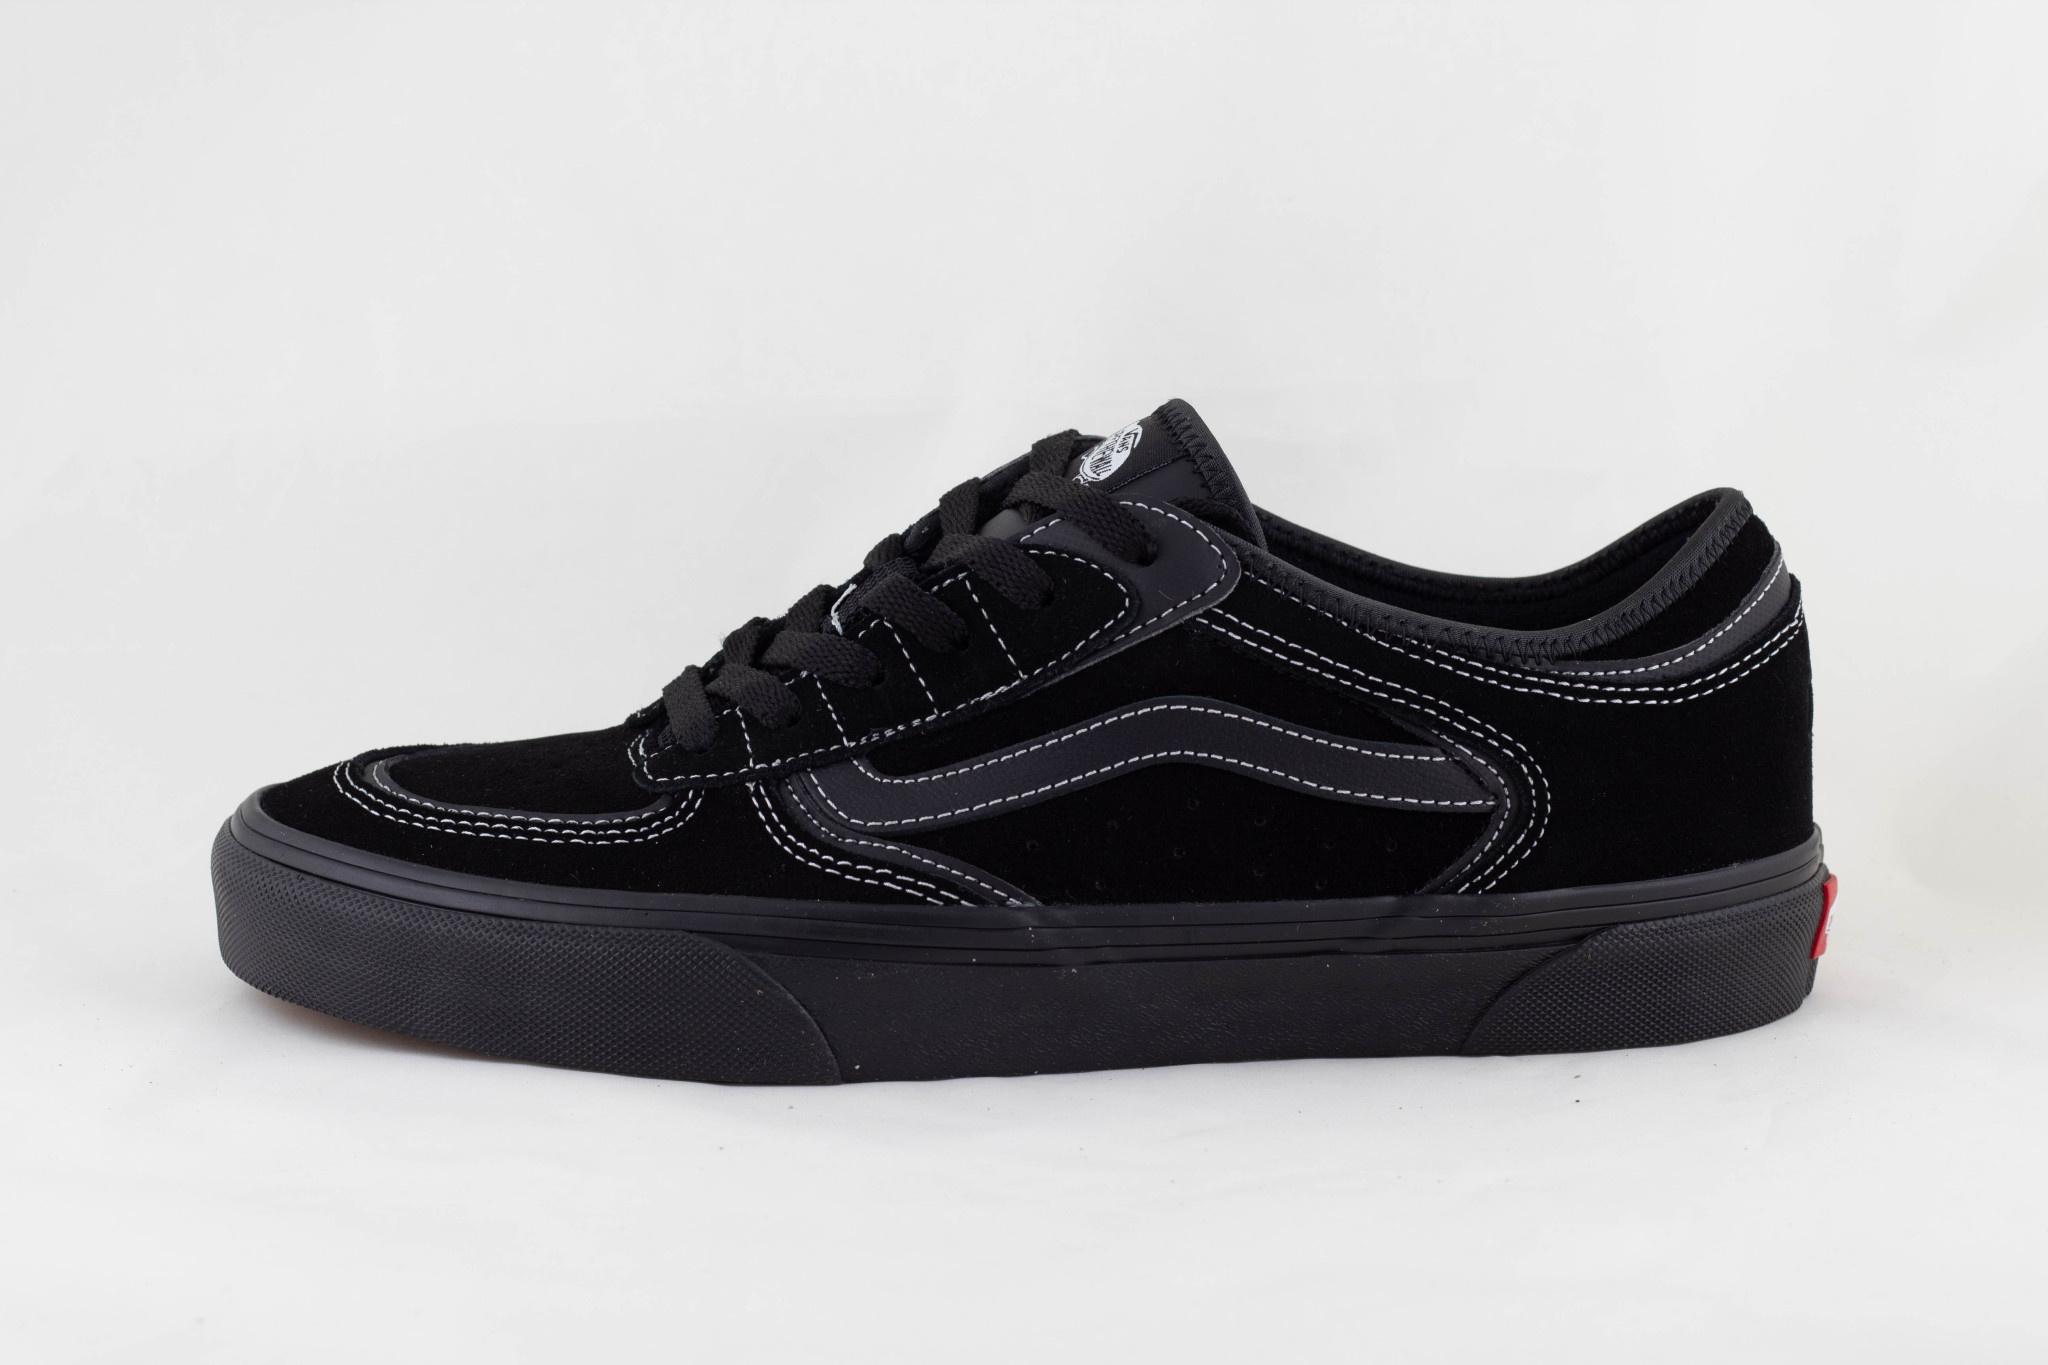 Vans VANS ROWLEY CLASSIC Black/ Black